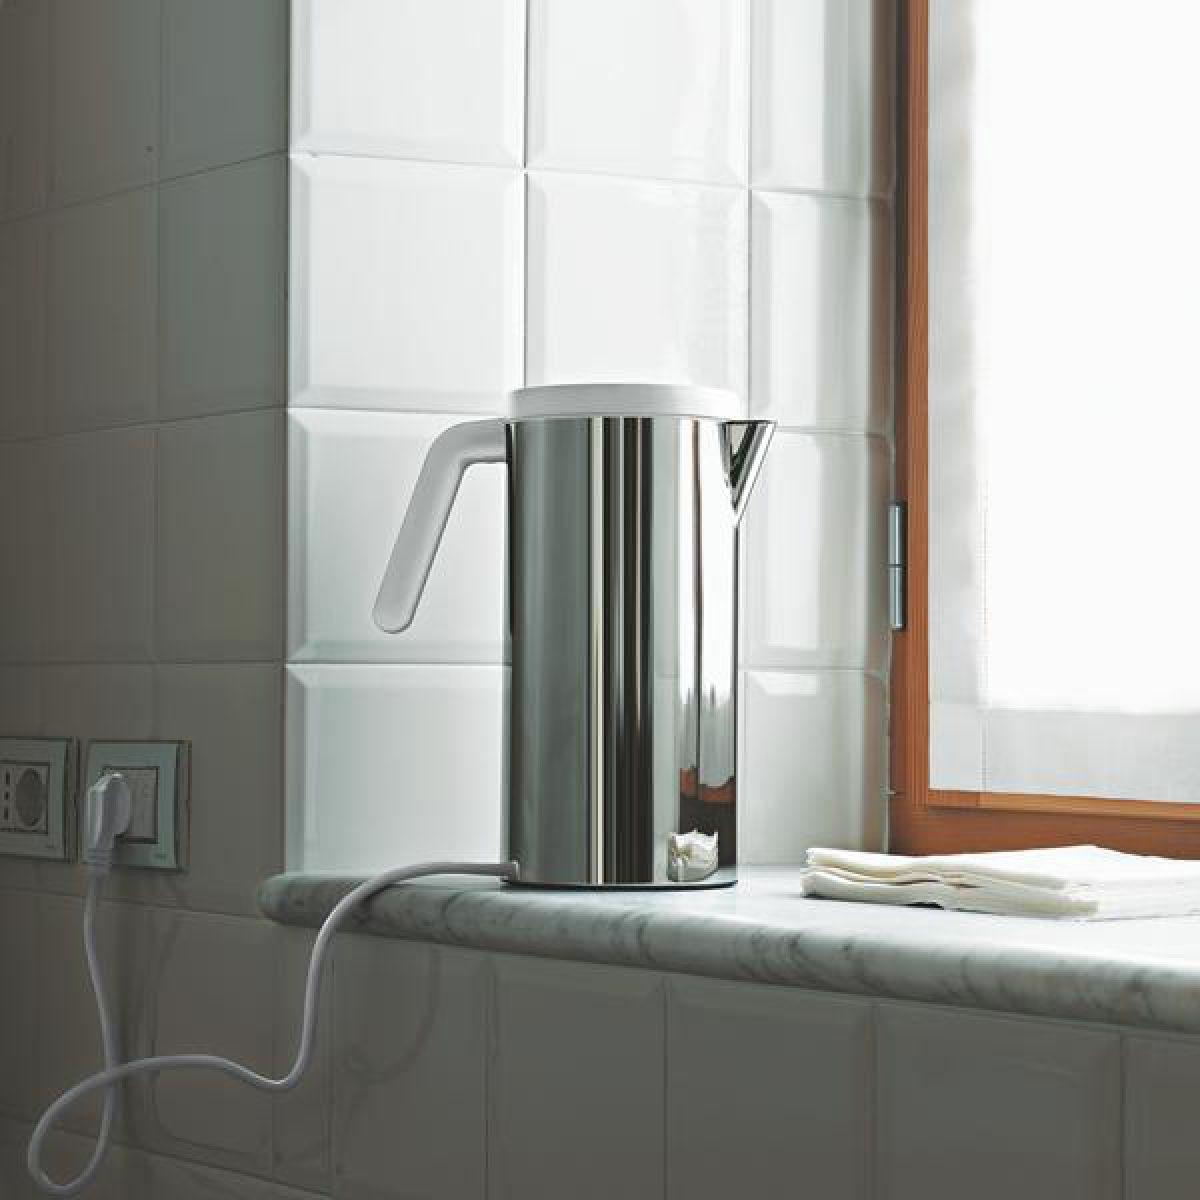 alessi hotit wasserkocher wei uvp 129 00 eur ebay. Black Bedroom Furniture Sets. Home Design Ideas